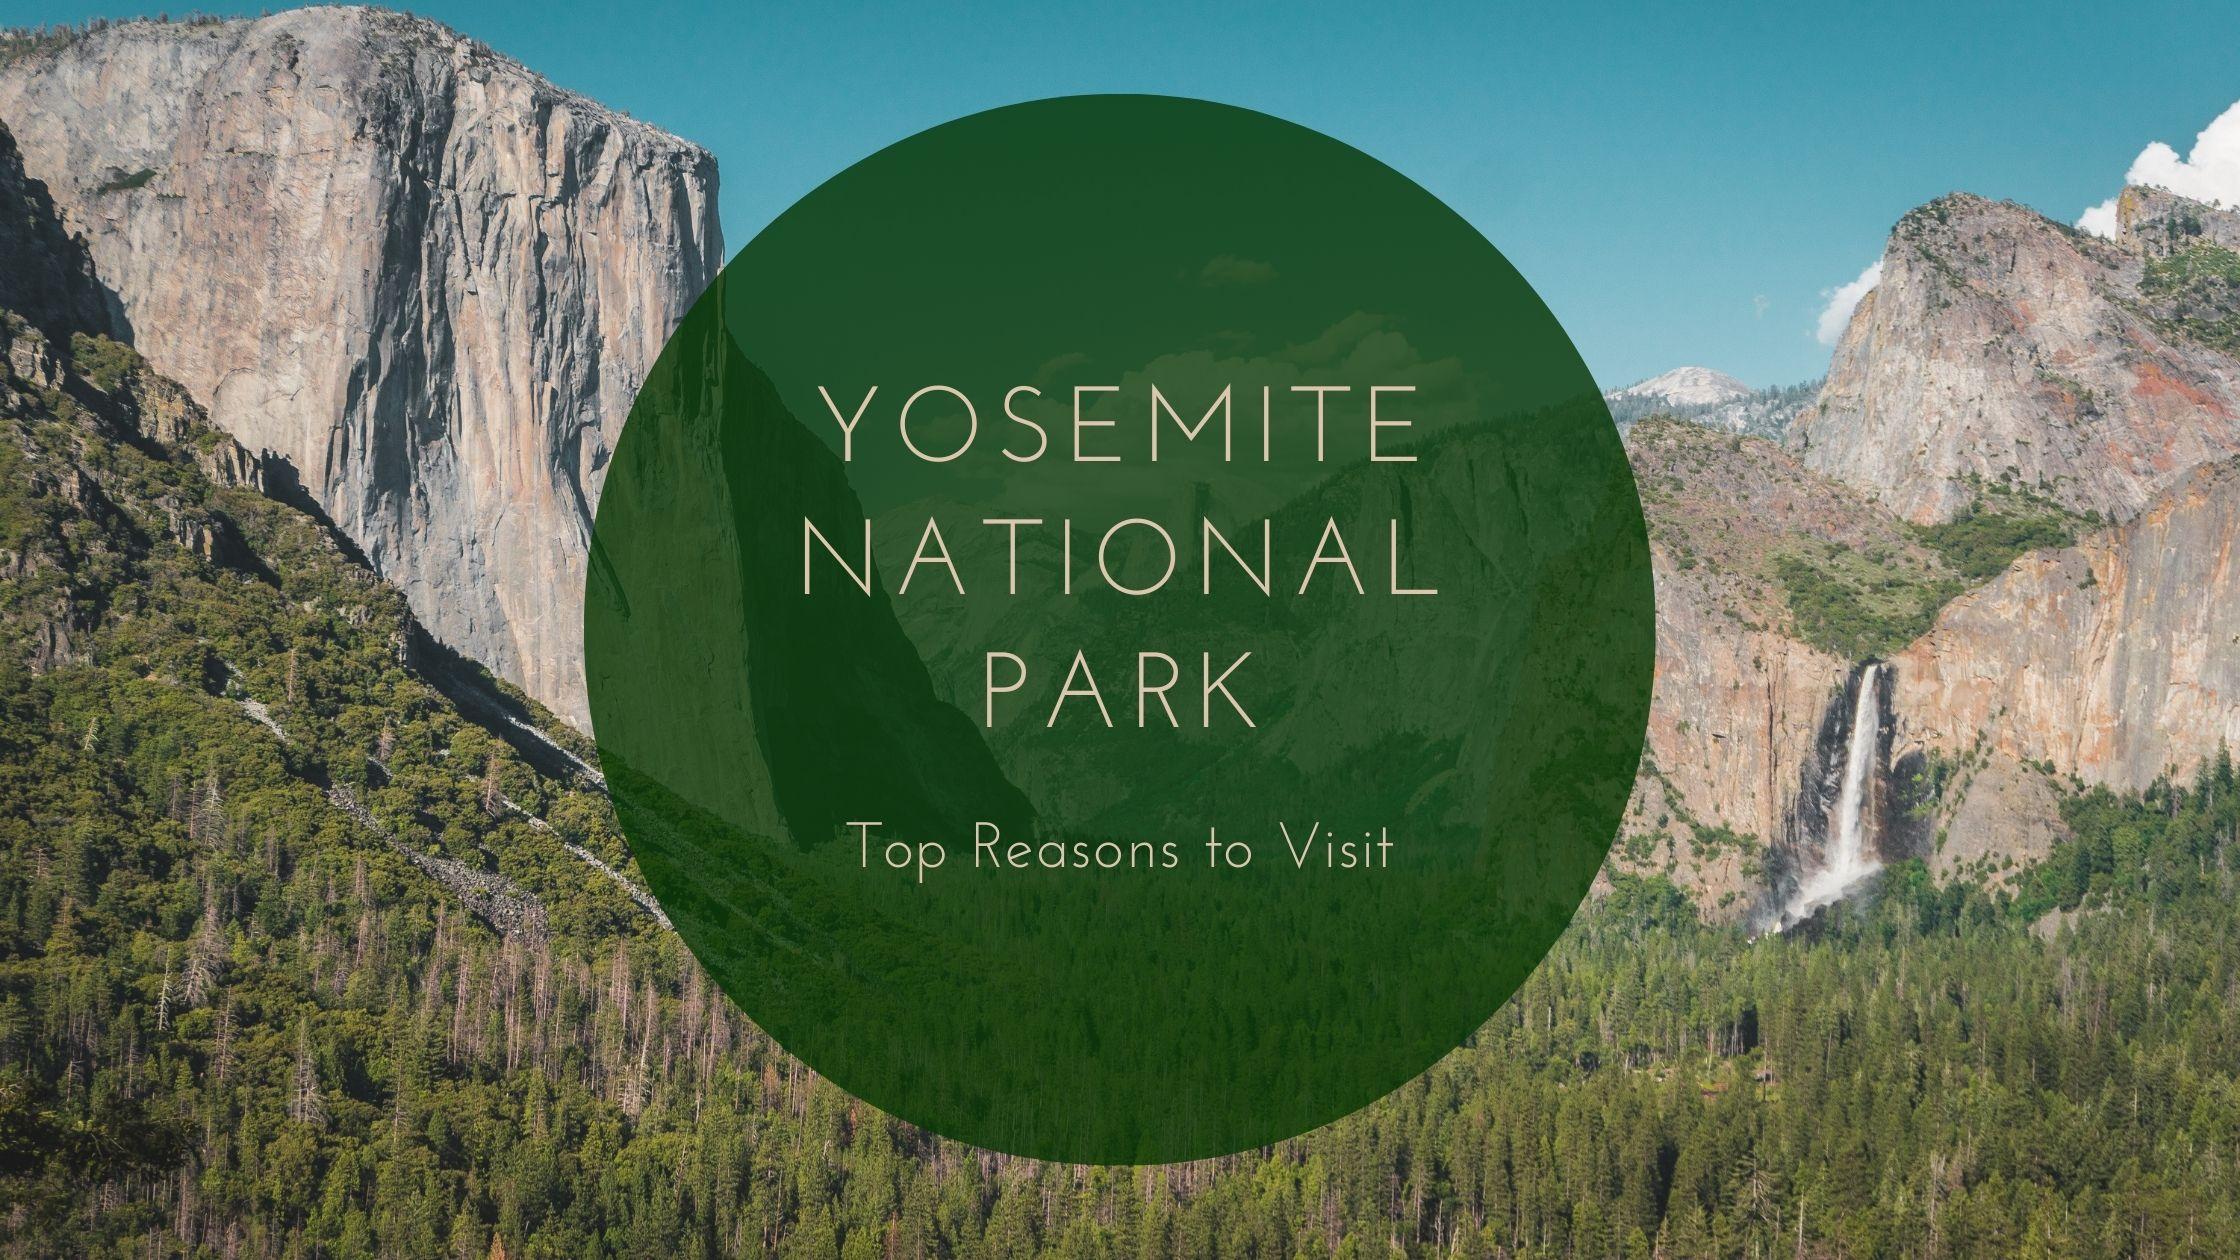 Top Reasons to Visit Yosemite National Park